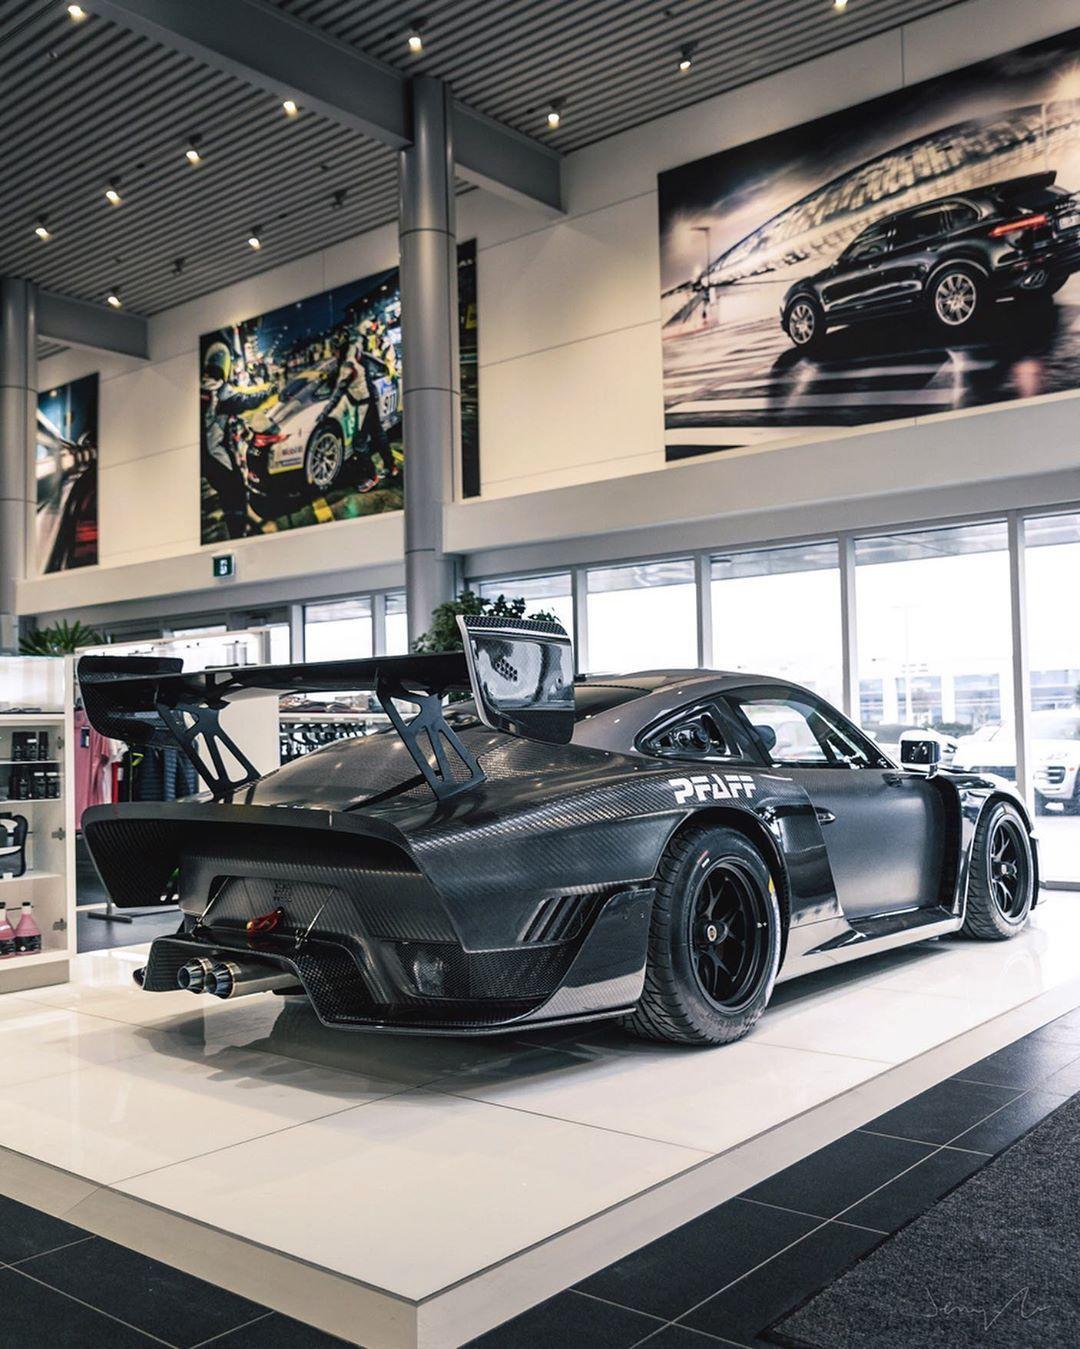 Pin By Vaniel On Ahyper Car In 2020 Porsche Super Cars Modified Cars